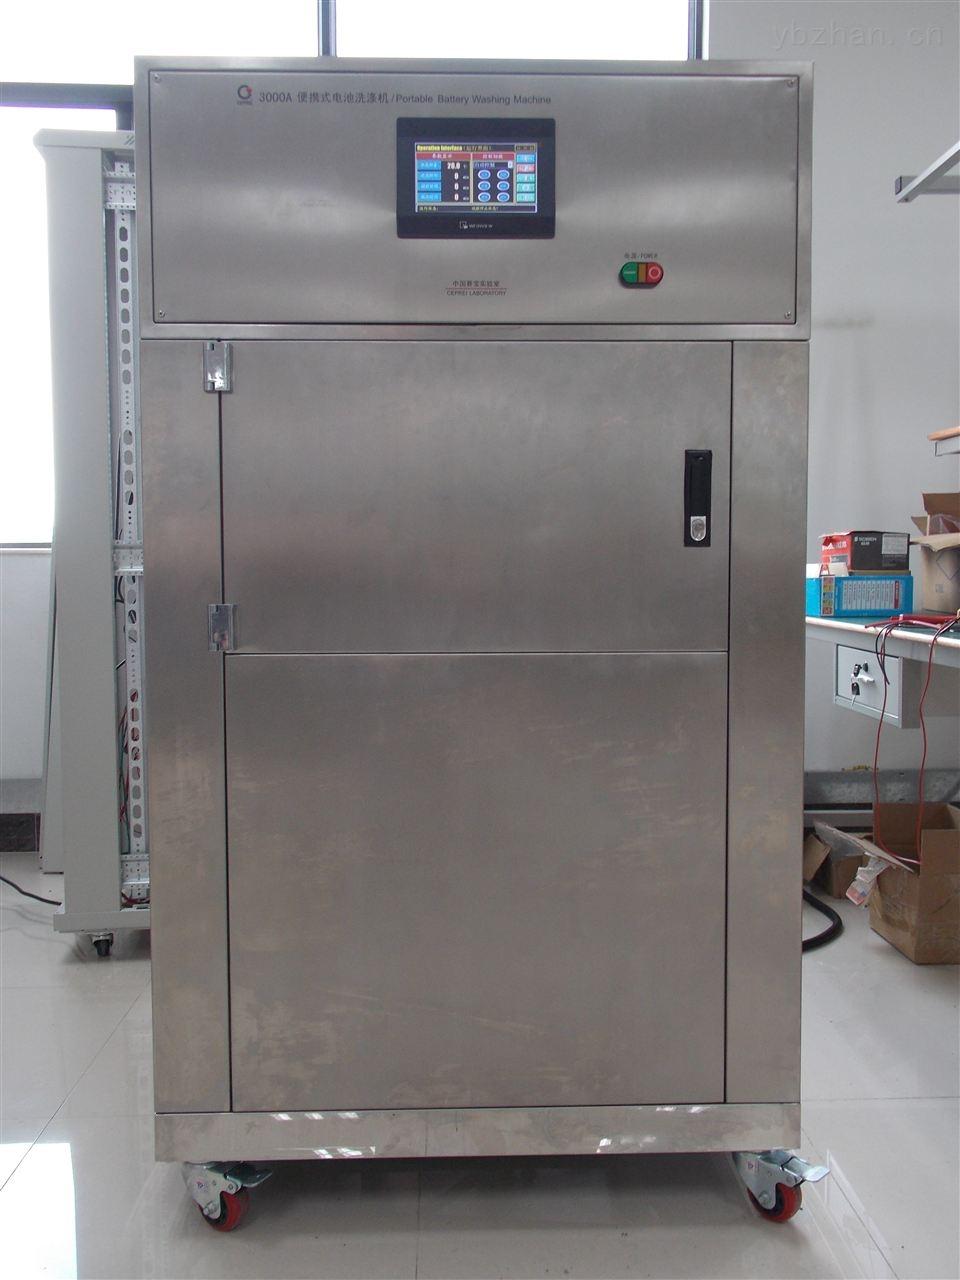 7206A便携式电池洗涤试验机/赛宝仪器